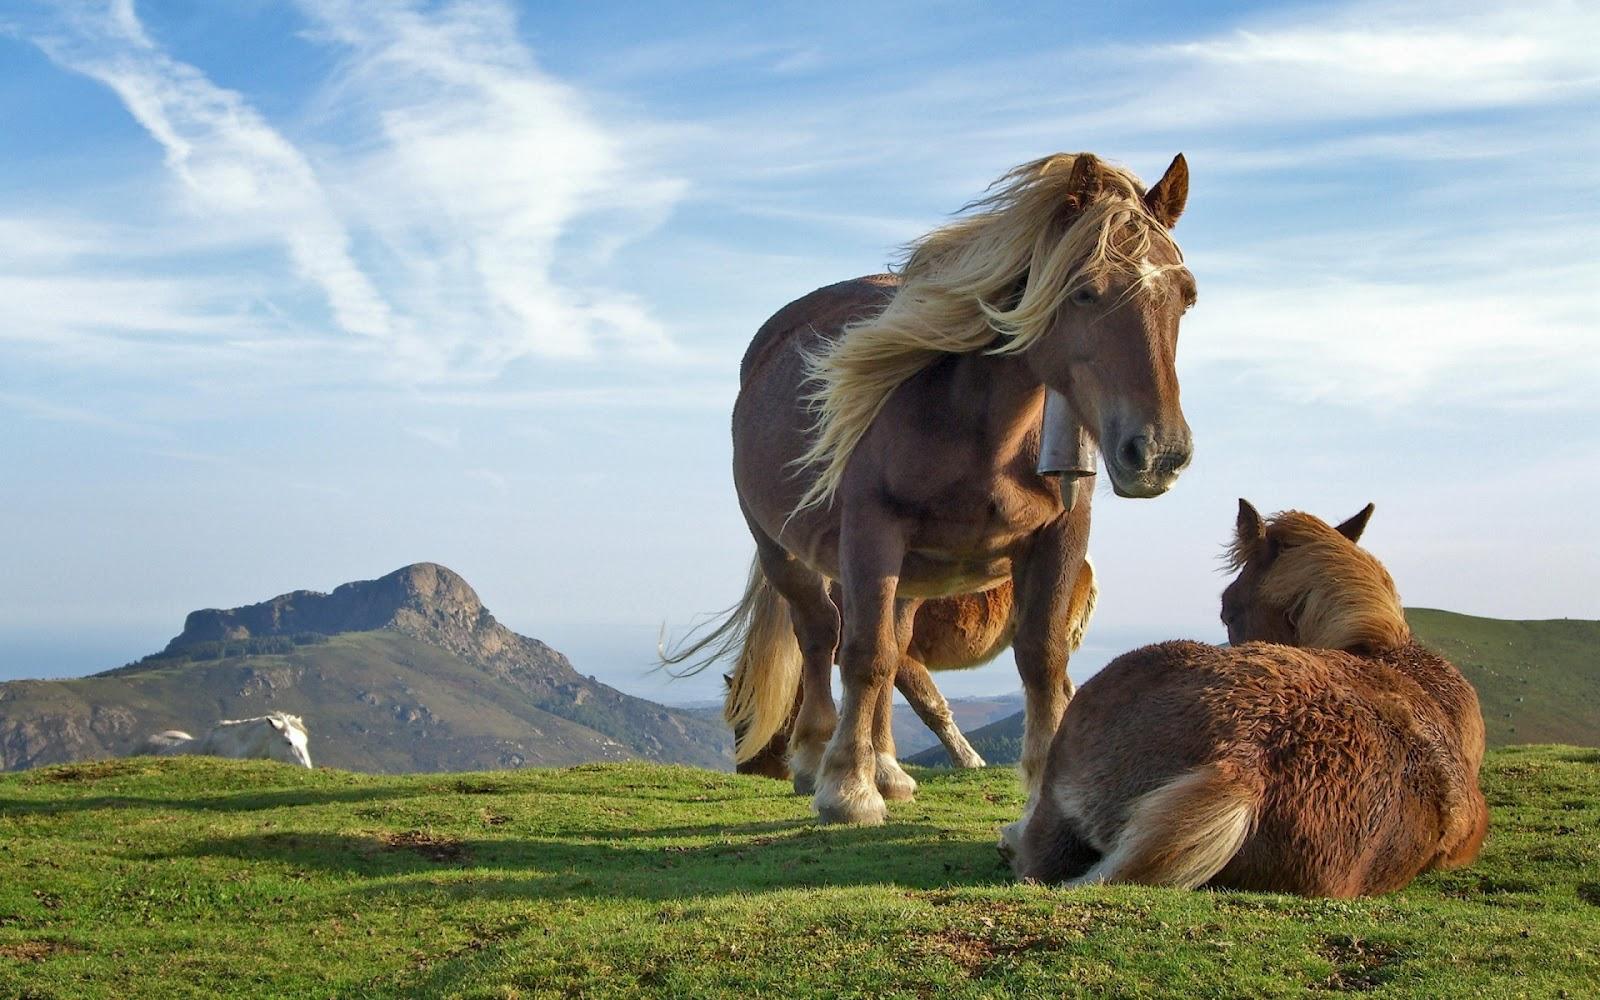 Wonderful   Wallpaper Horse Pinterest - hd+horse+wallpaper  Best Photo Reference_132674.jpg